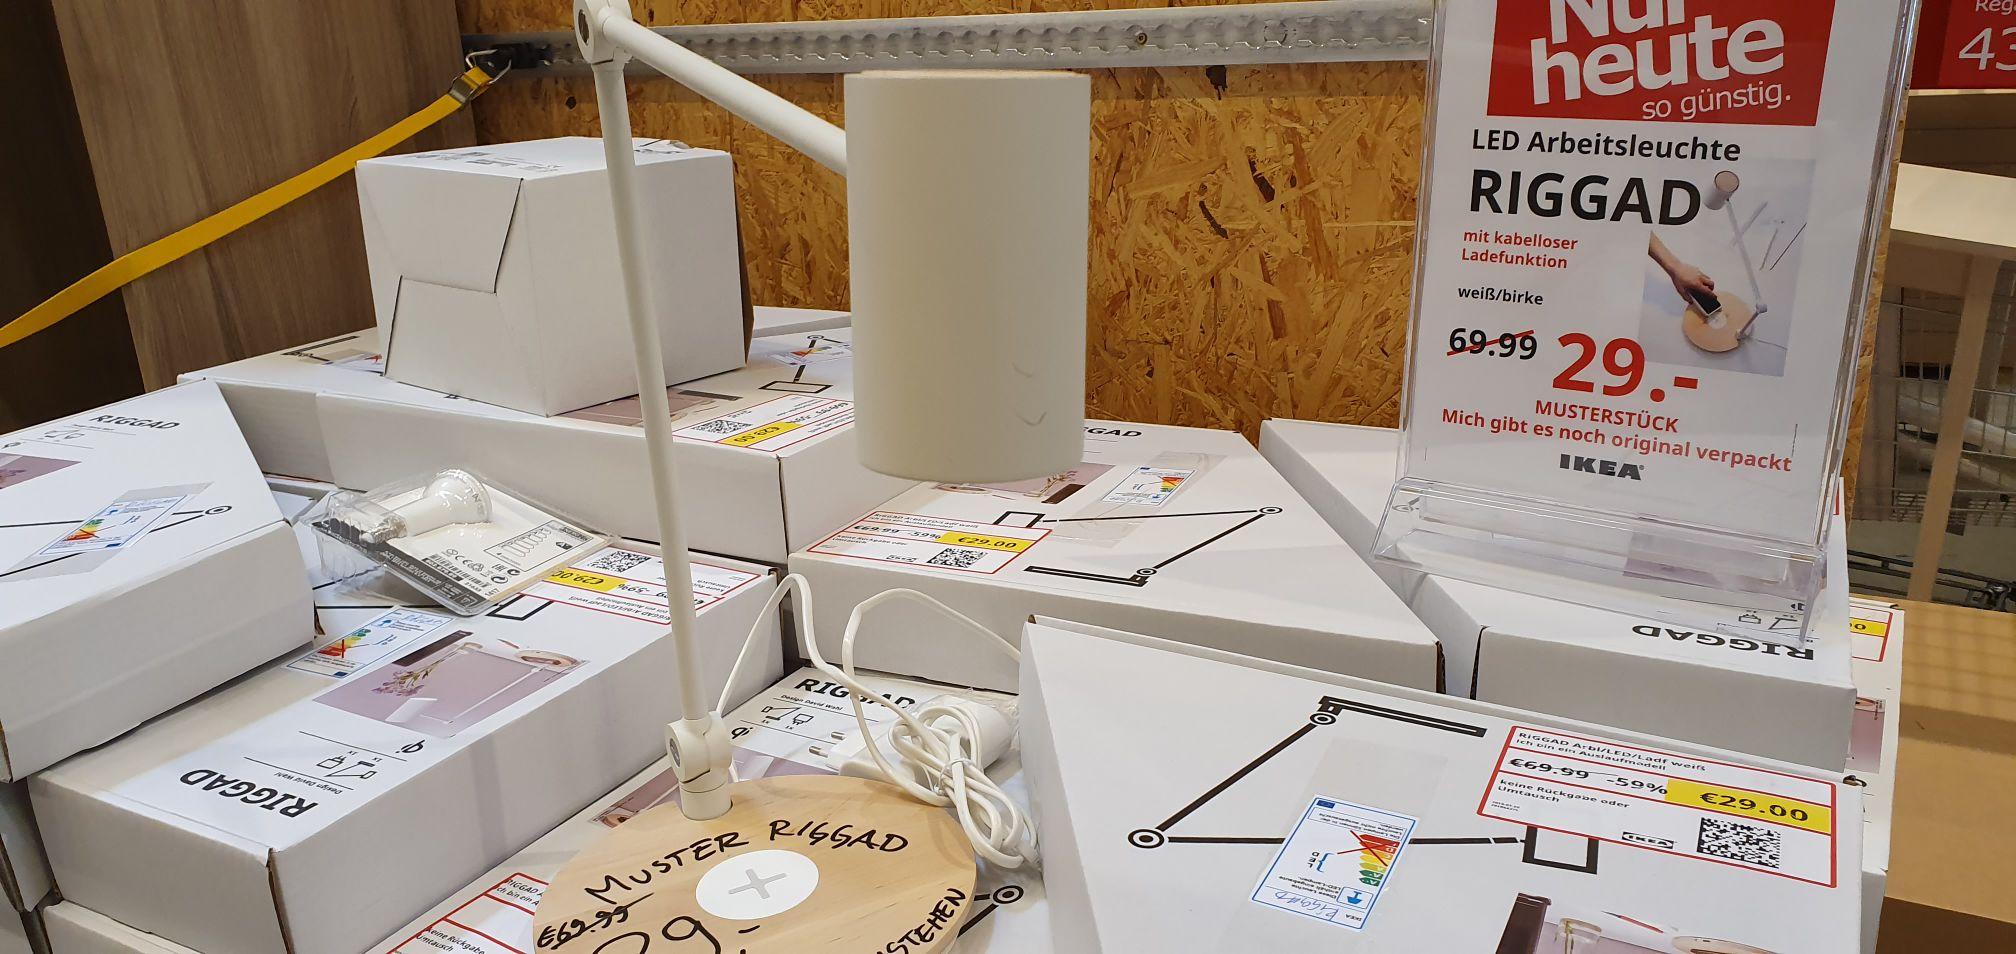 [Lokal] Ikea Frankfurt Riggad Led Arbeitsleuchte im Ausverkauf